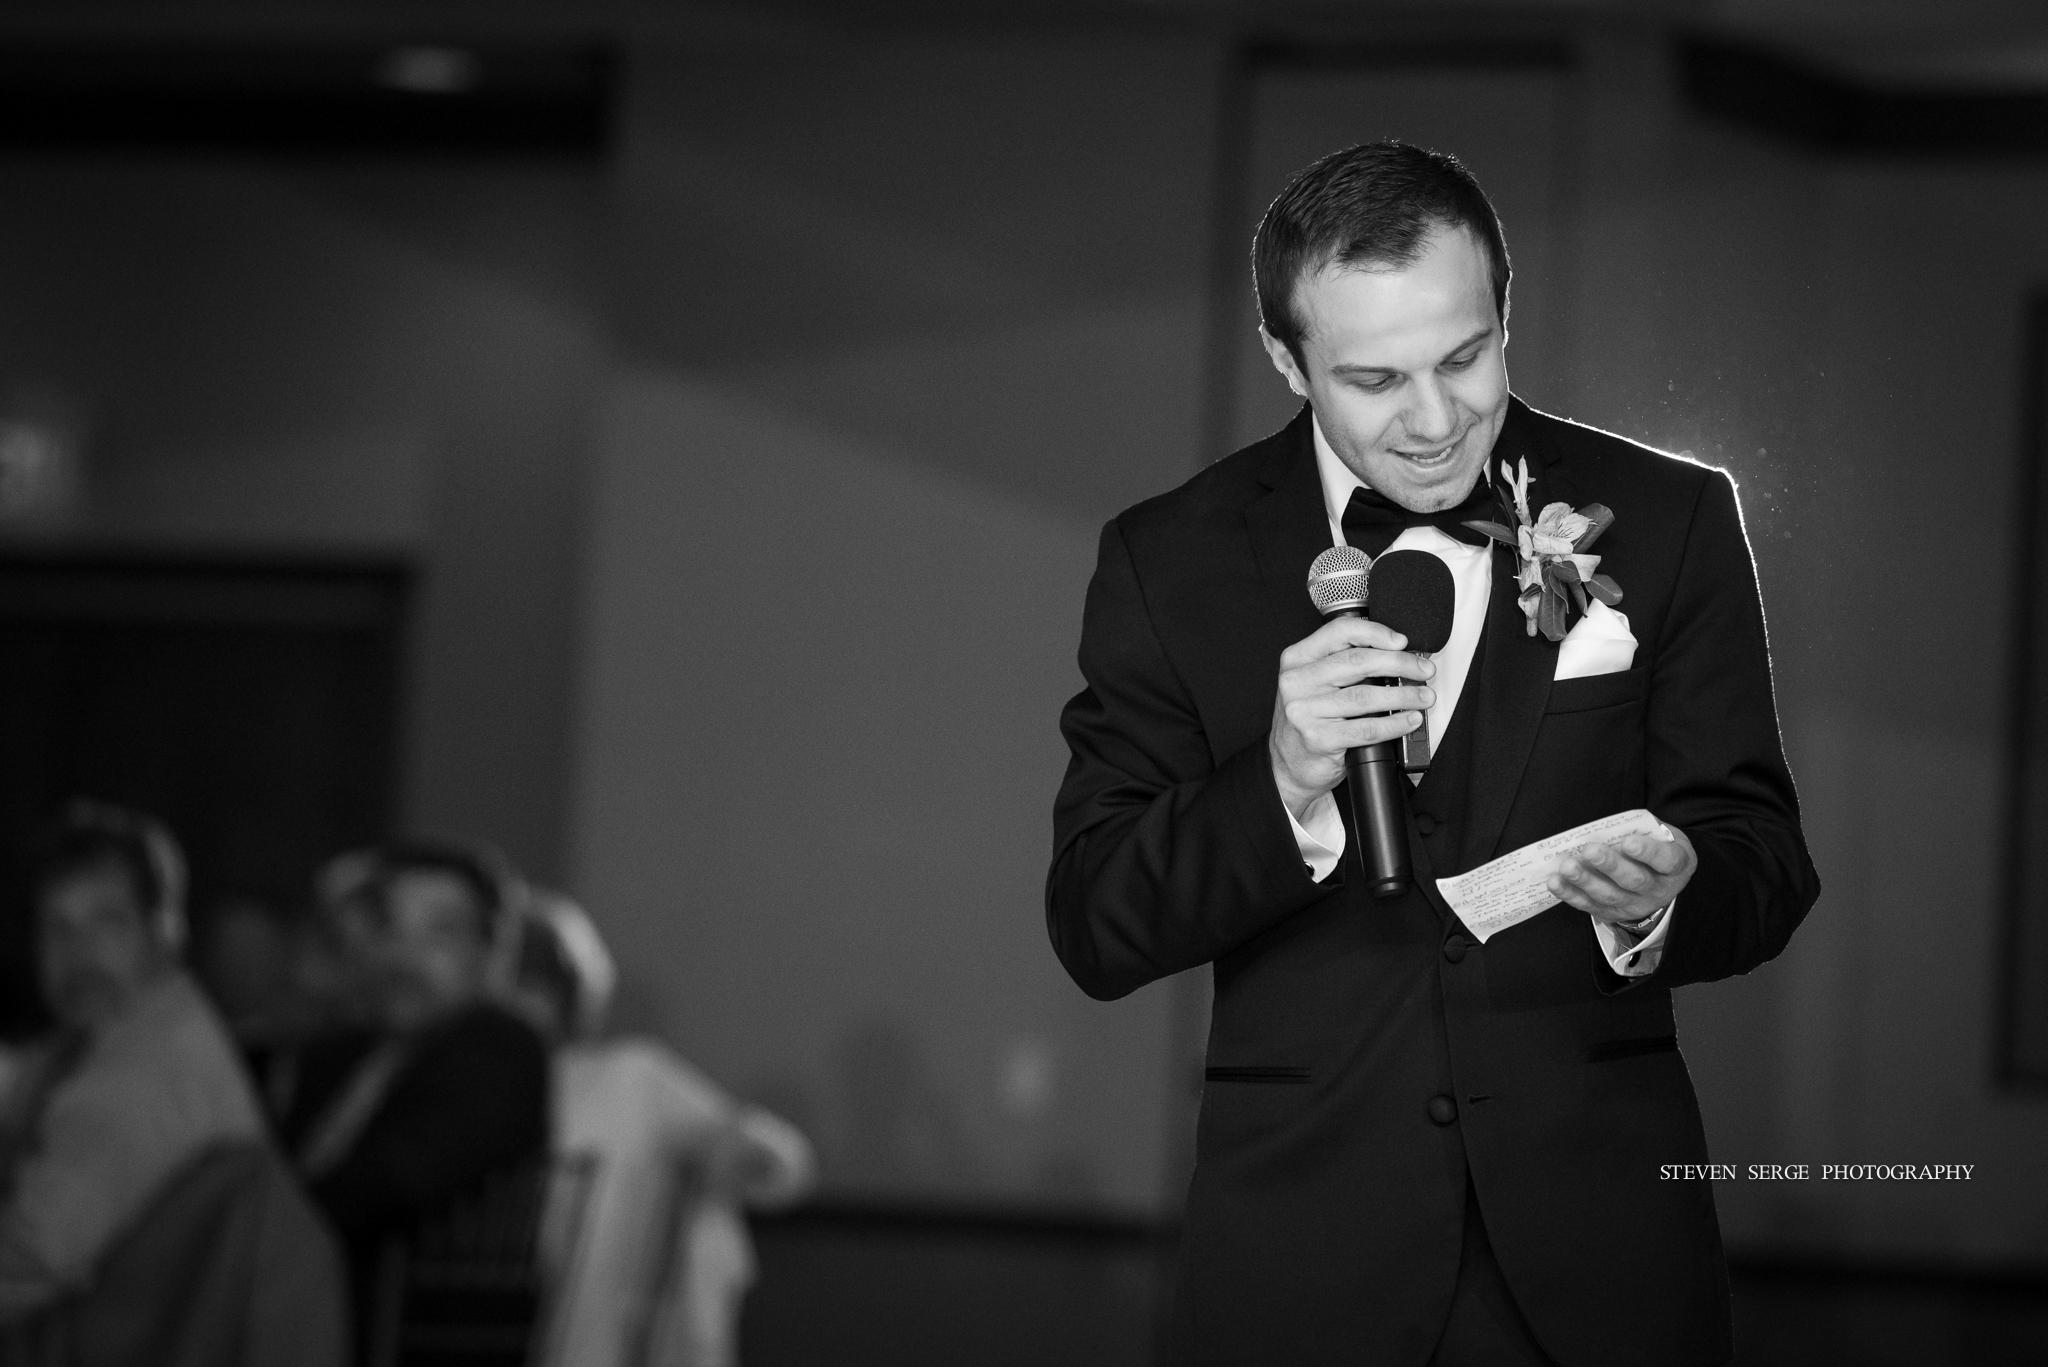 scranton-wedding-photographers-hilton-steven-serge-photography-20.jpg